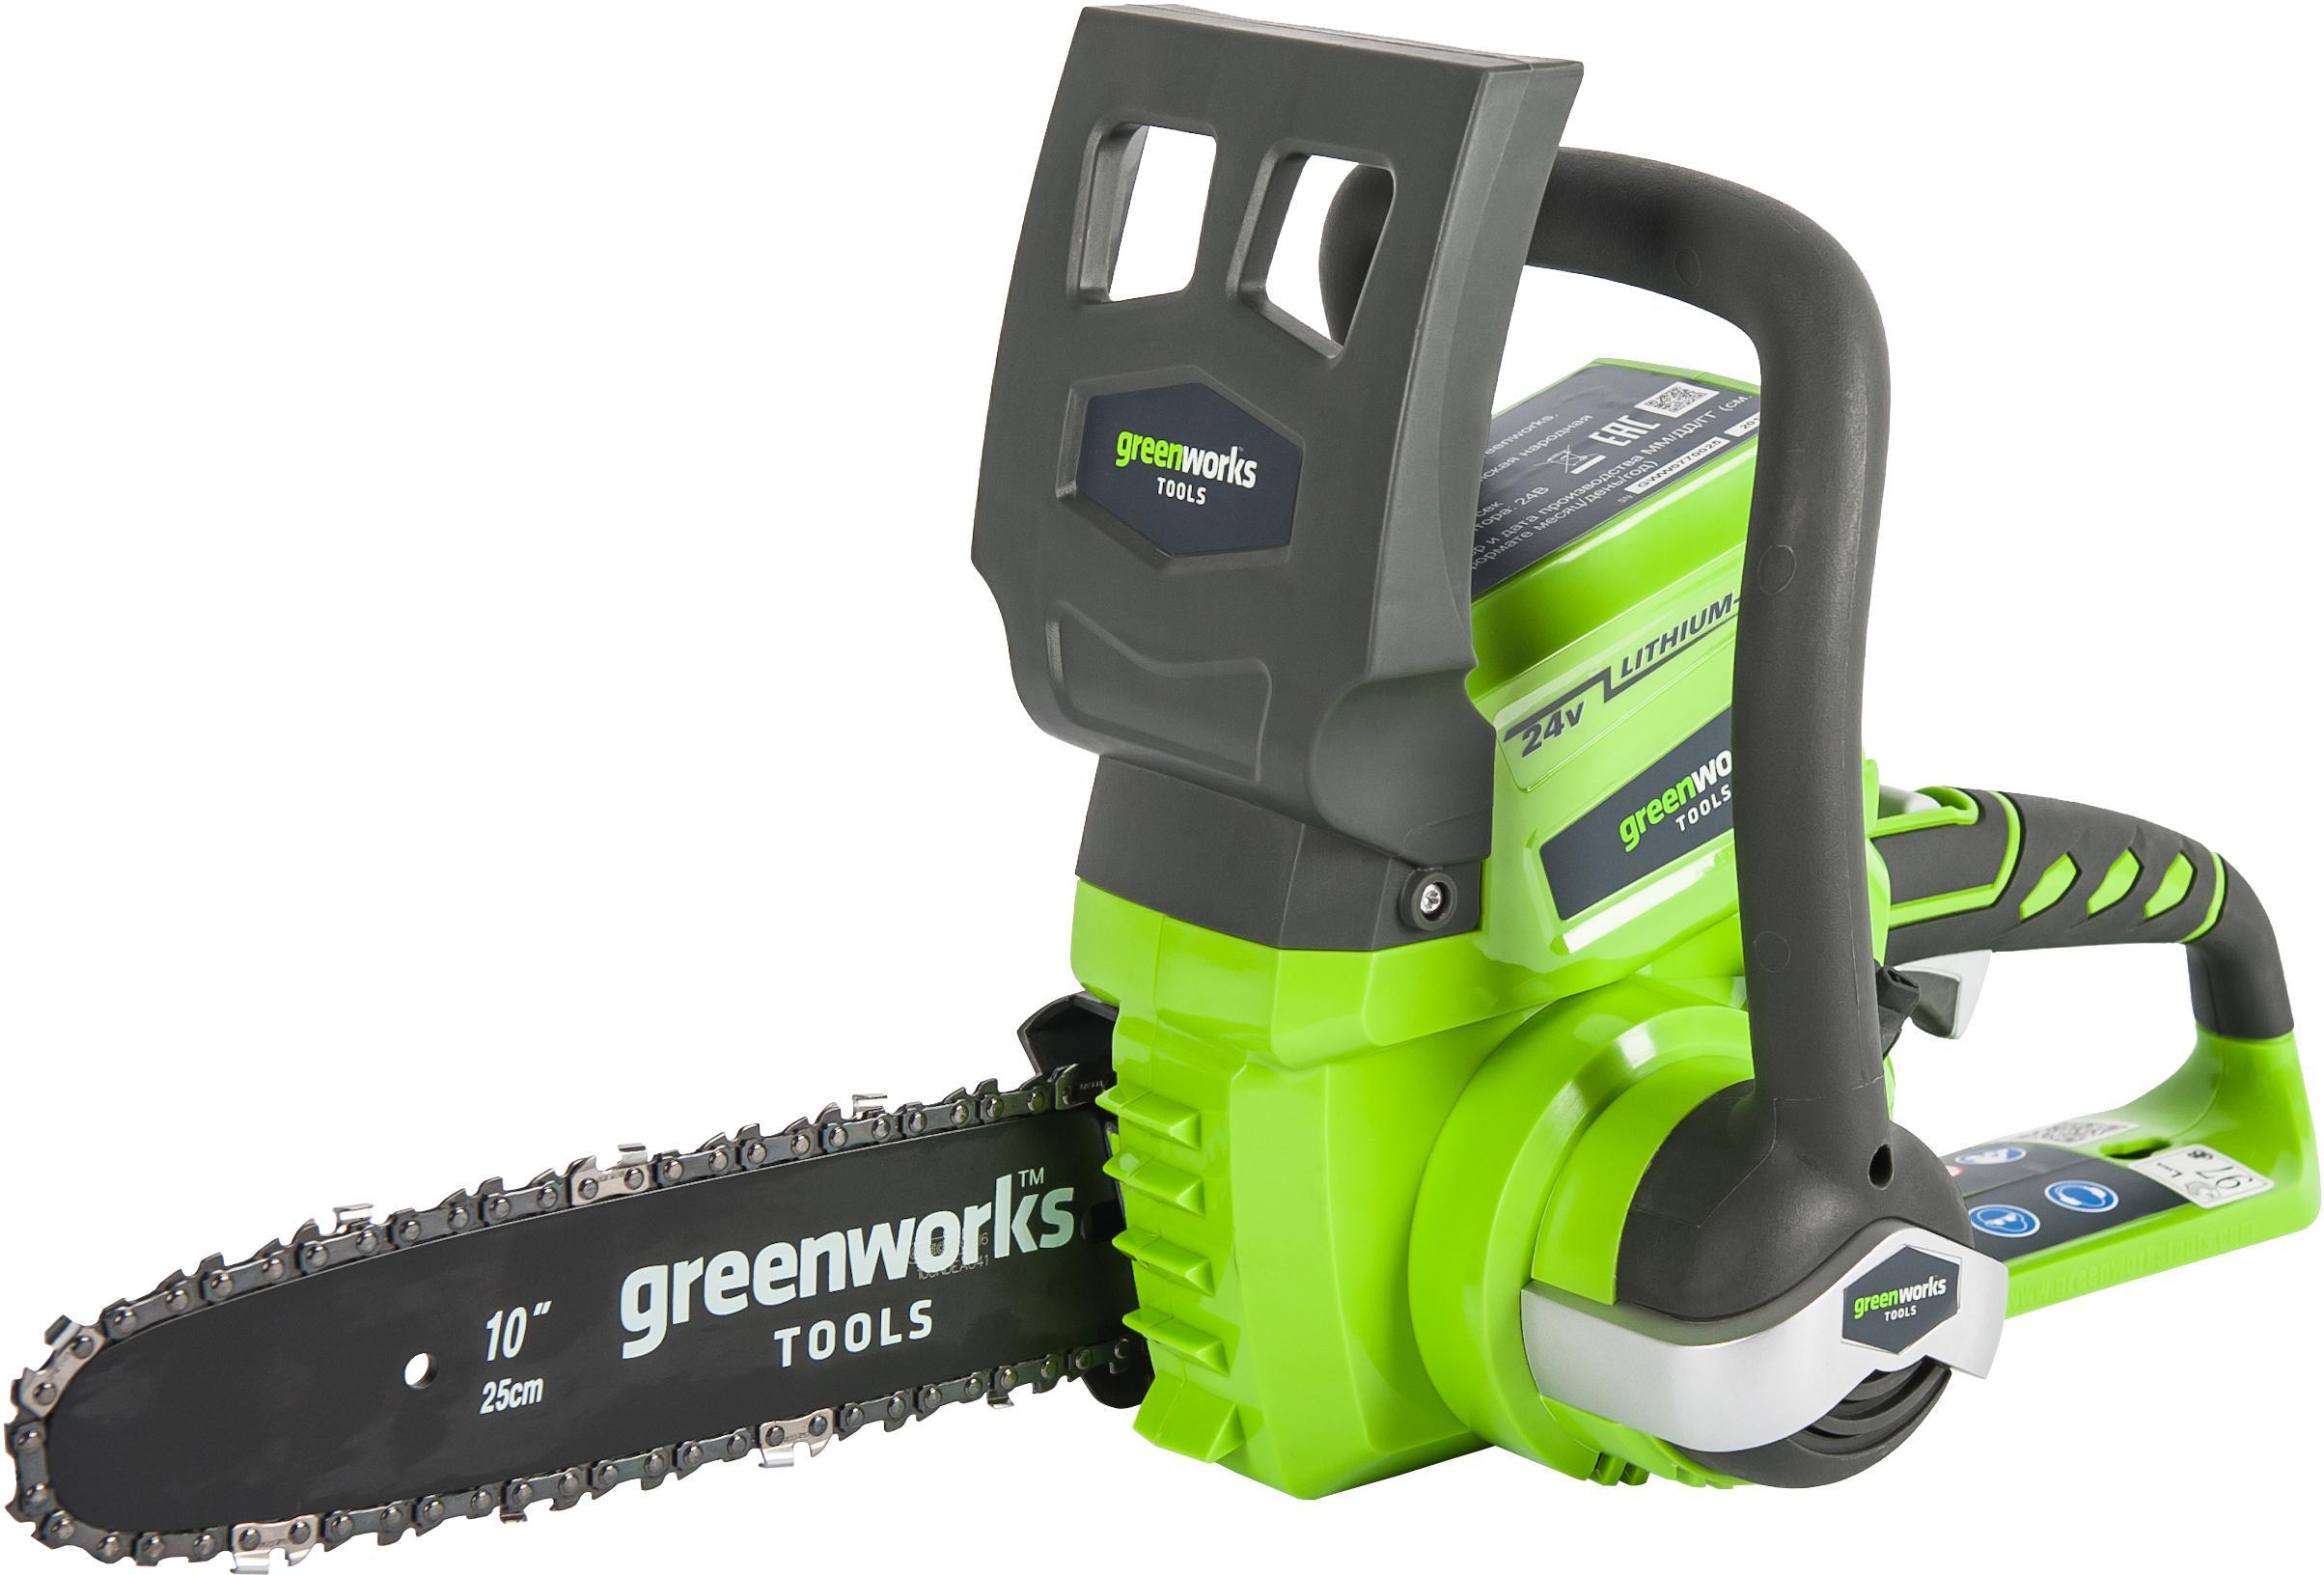 Пила цепная аккумуляторная Greenworks Gd24csk2 (2000007va) 1акк 24В 2Ач + ЗУ пила цепная аккумуляторная greenworks gd60cs40 2001807 без аккум и зу